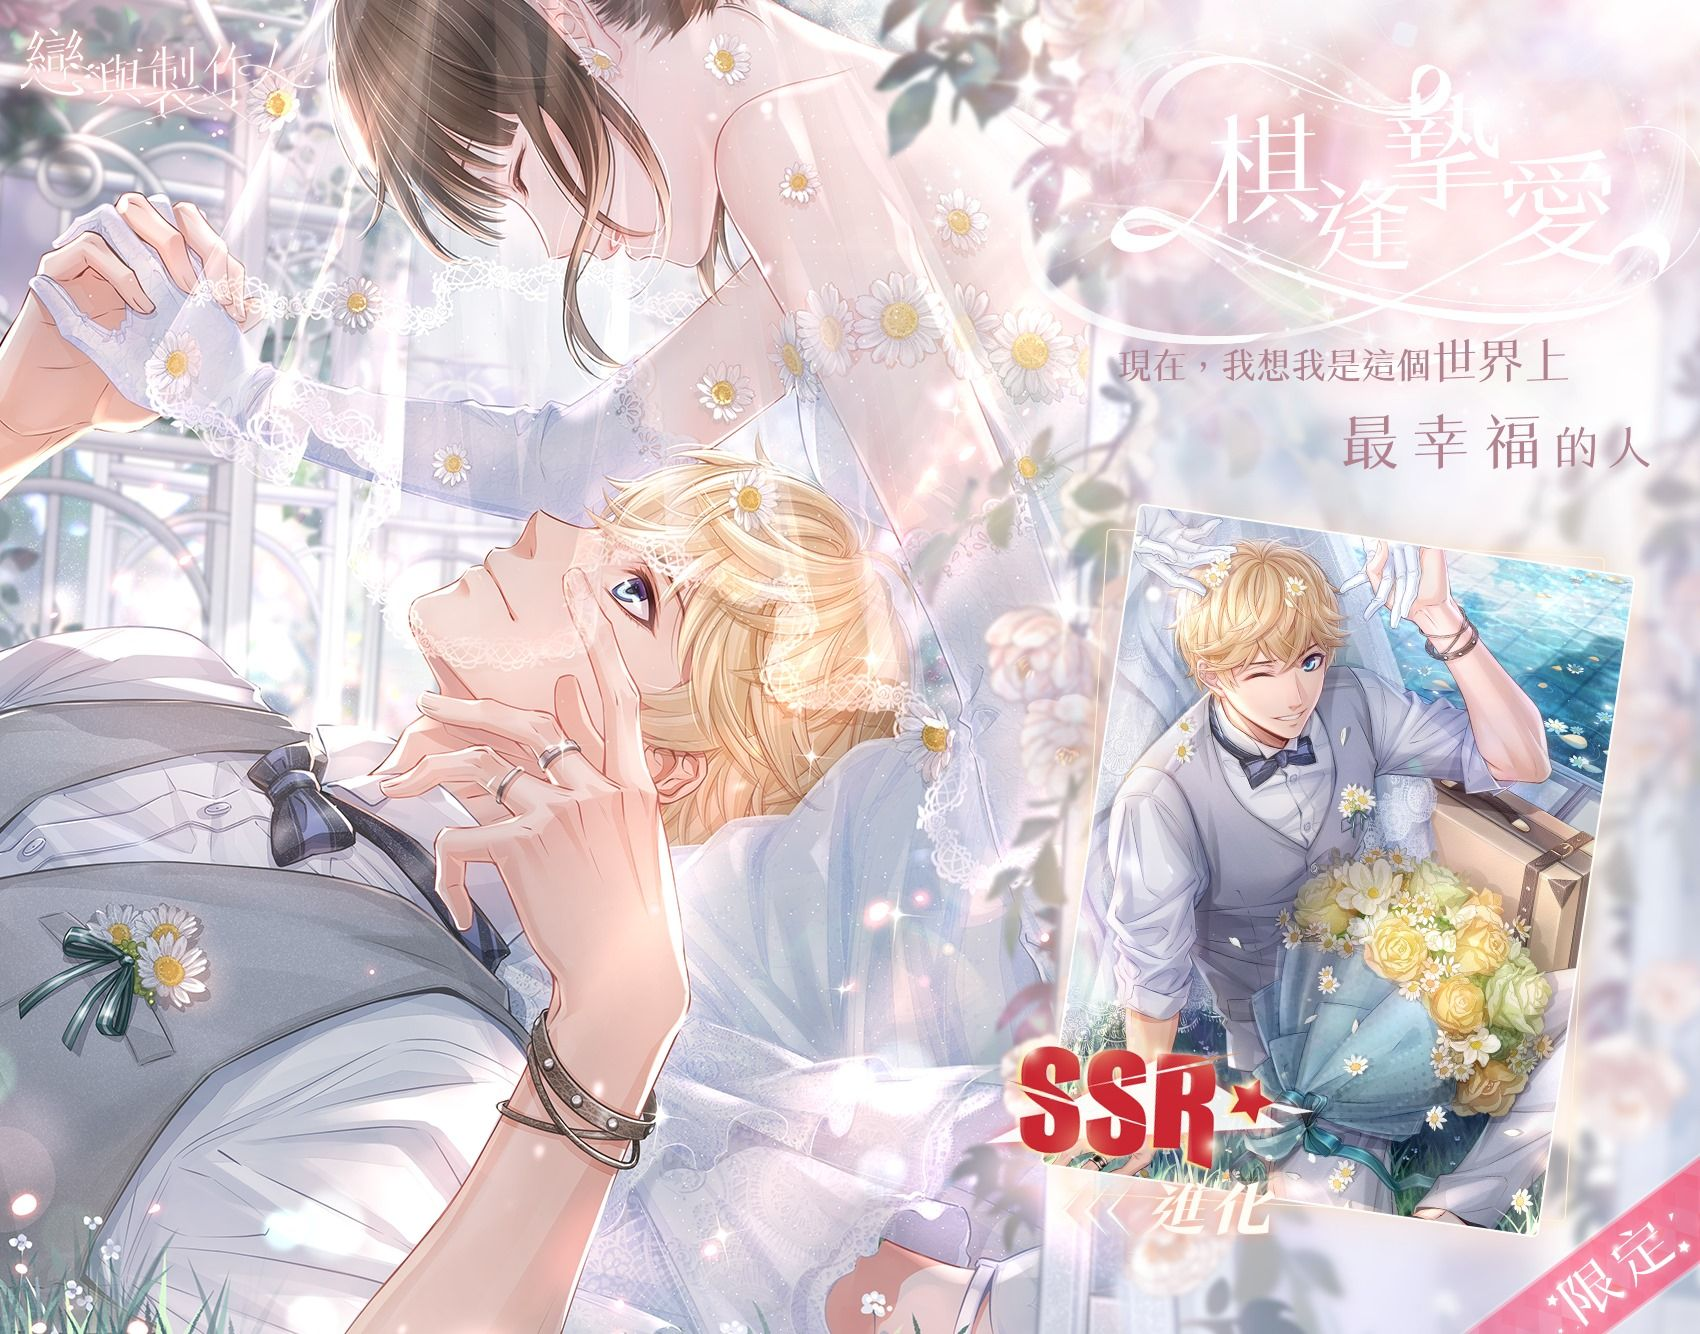 Pin by Lilian Chien on 戀與製作人-周棋洛 in 9  Anime romance